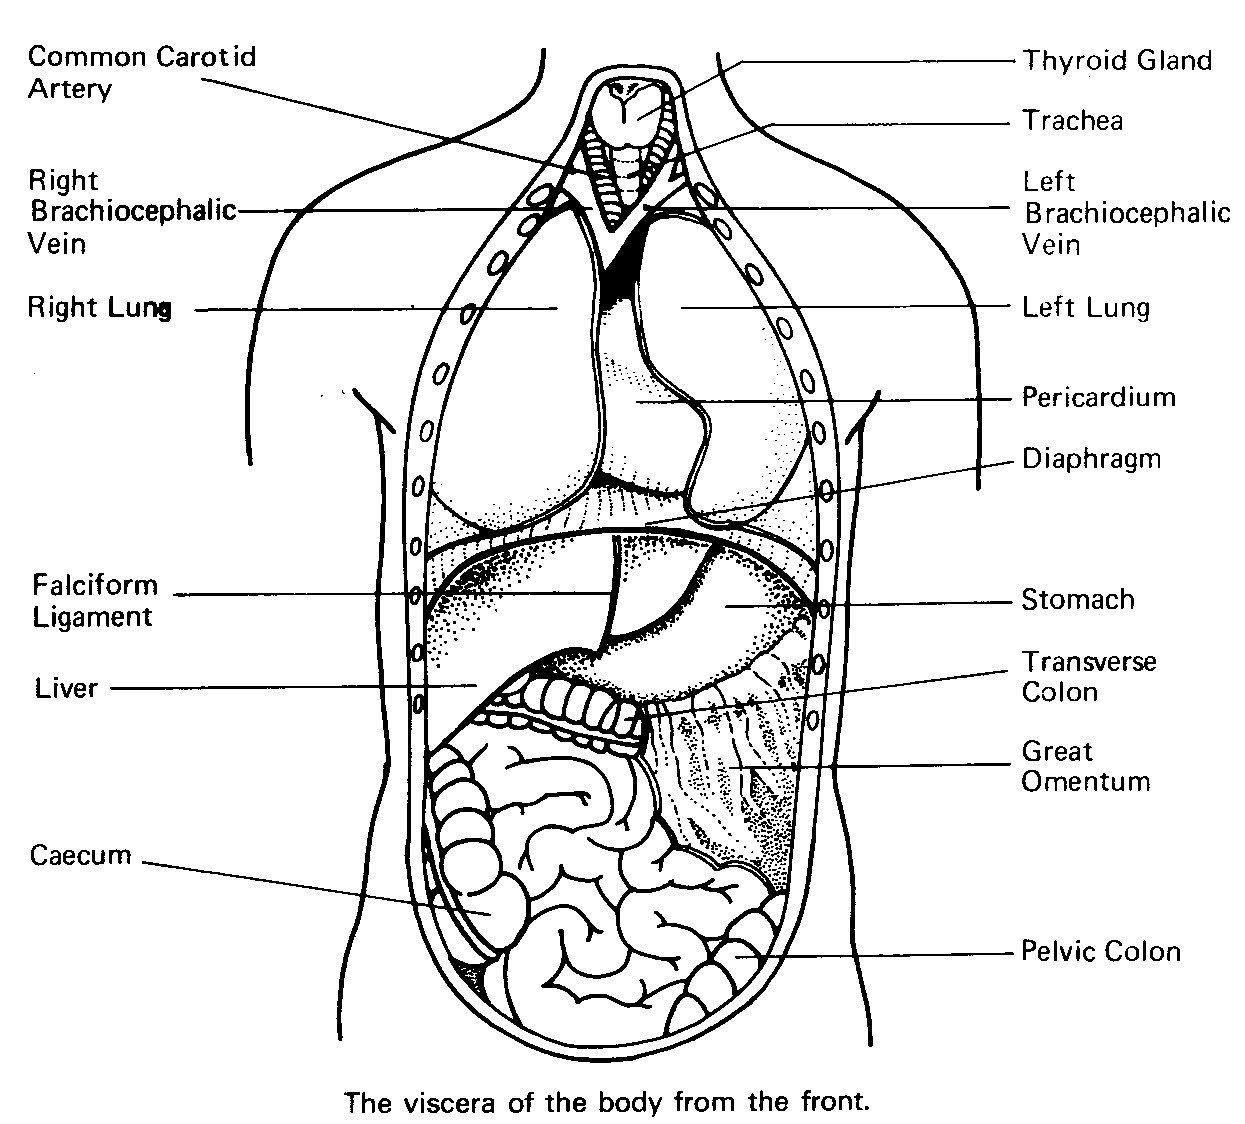 Anatomy Coloring Pages Human Organs Coloring Page Anatomy Coloring Pages Coloringsuite Albanysinsanity Com Anatomy Coloring Book Human Body Organs Human Body Printables